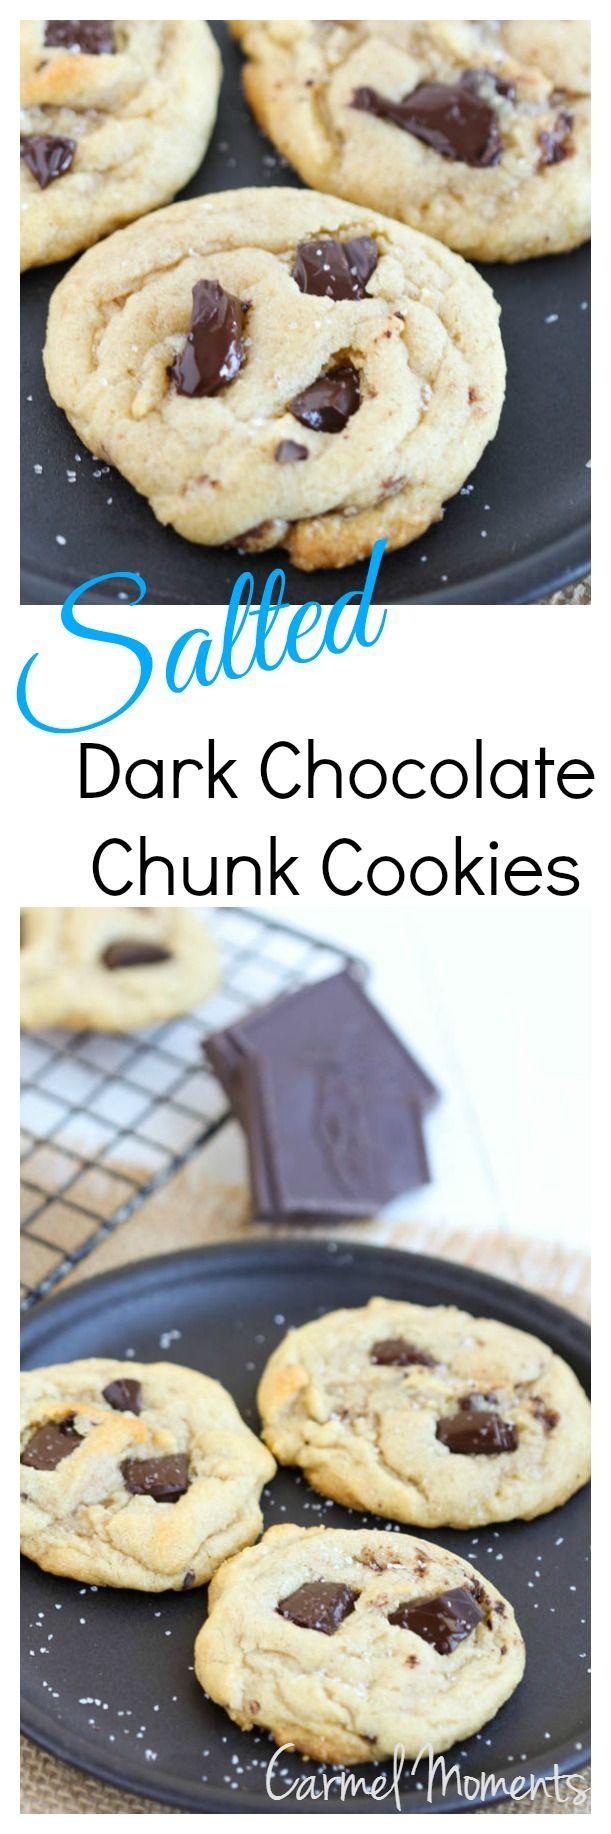 ... Cookies on Pinterest | Chocolate chip cookies, Peanut butter cookies